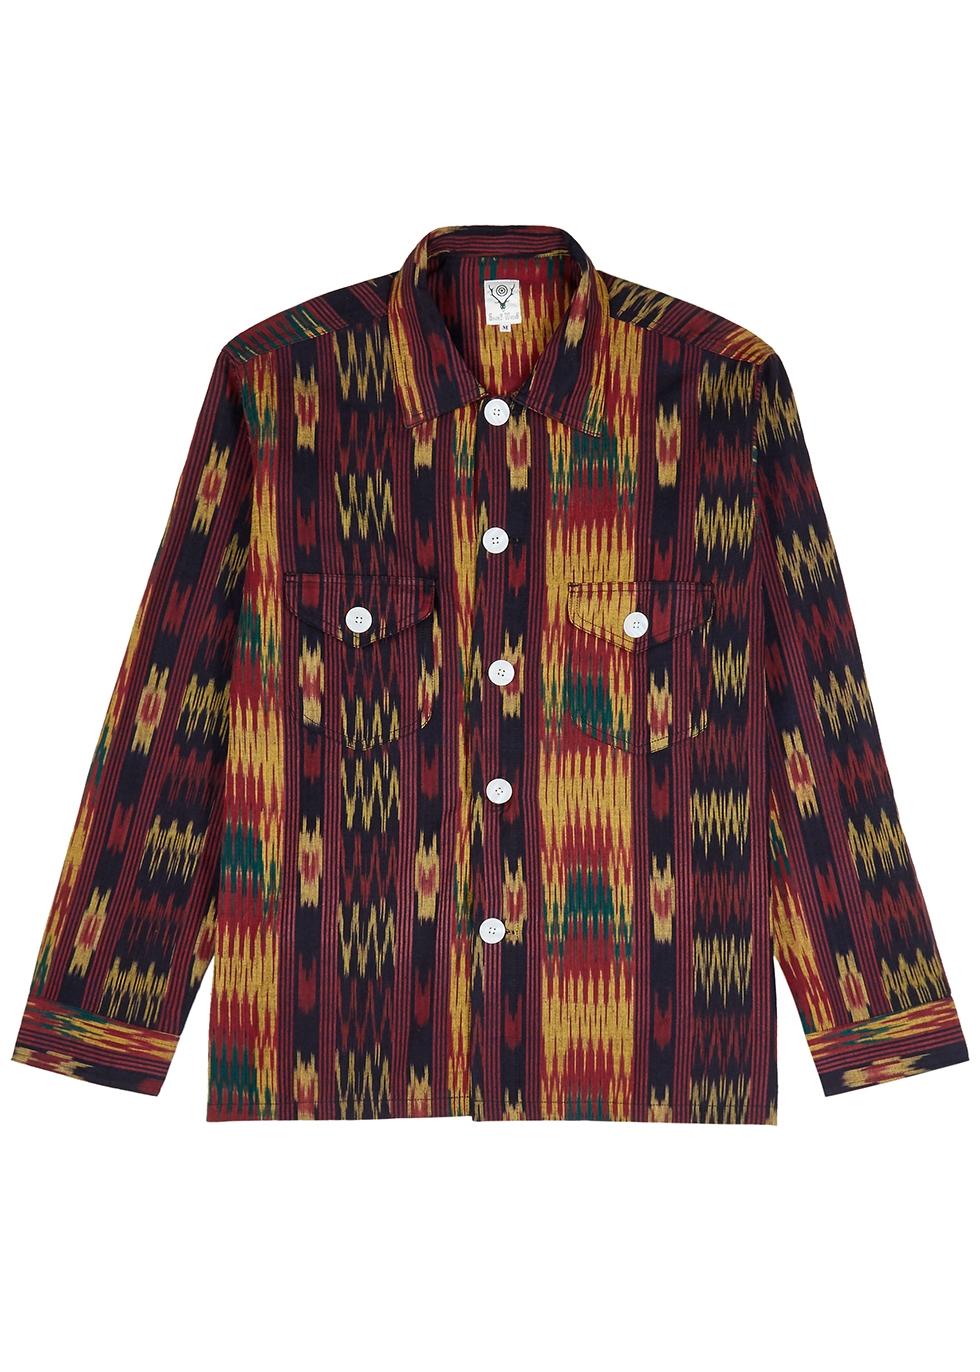 Smokey printed cotton shirt - South2 West8